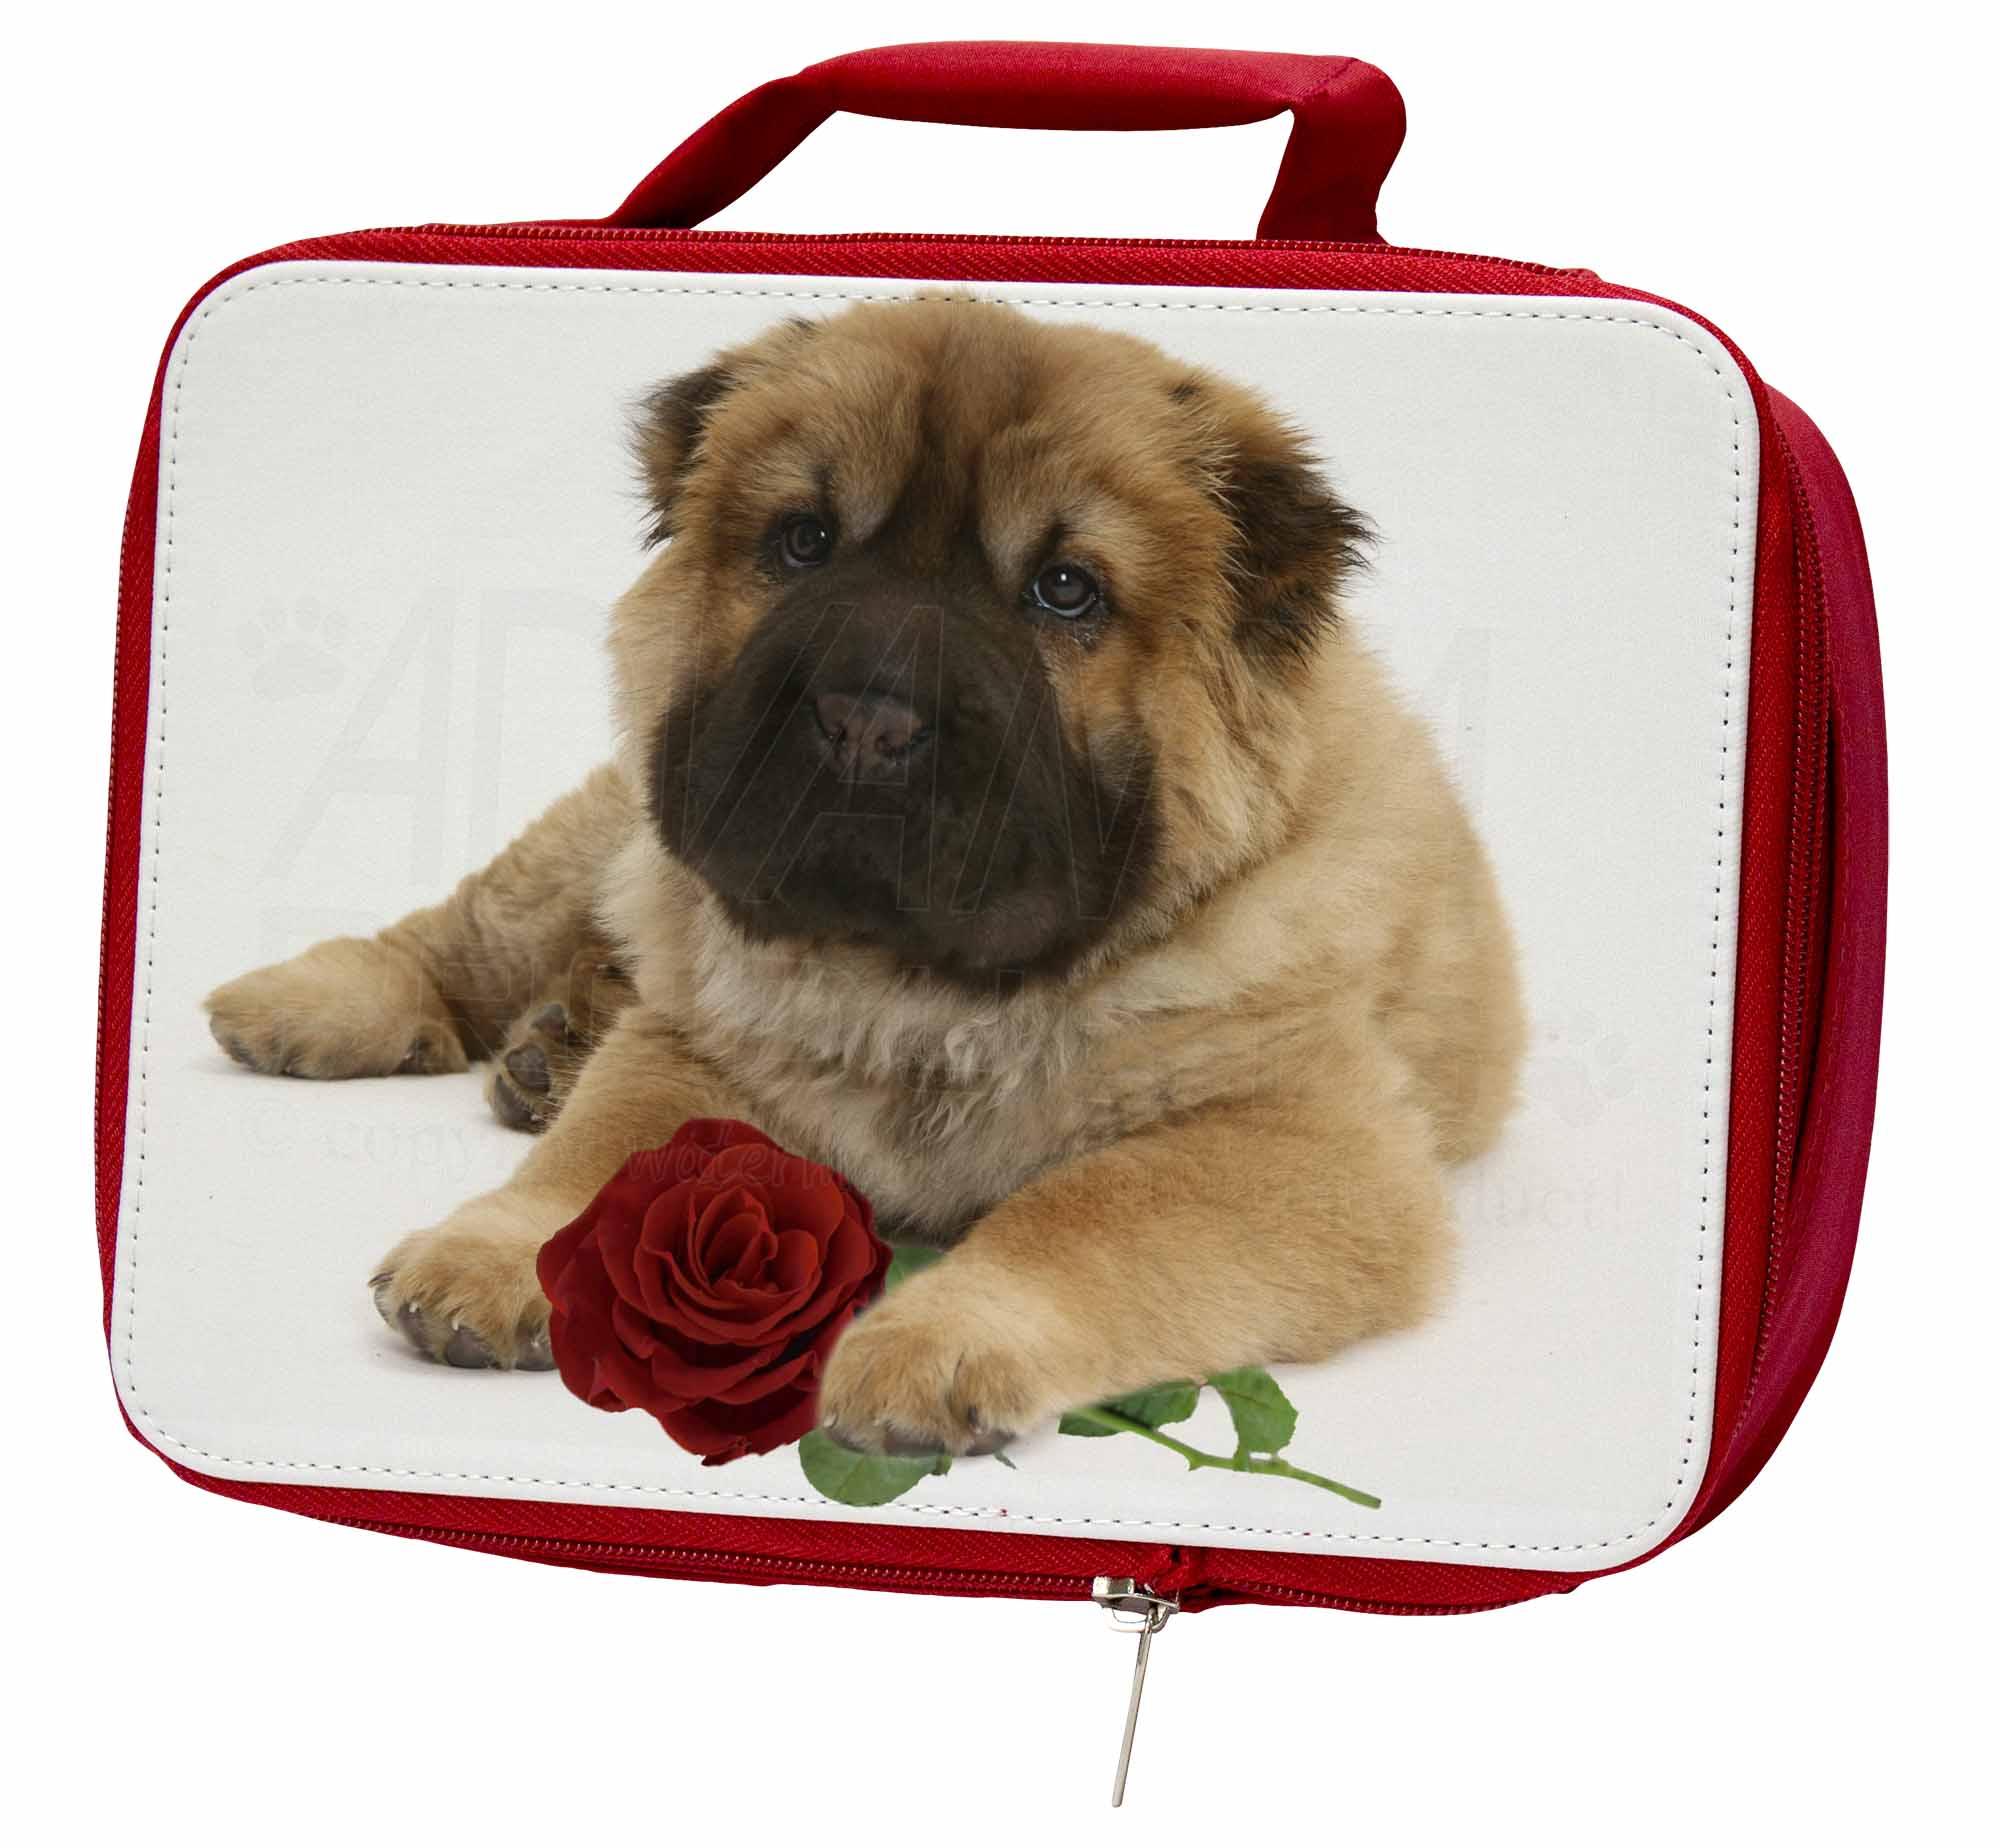 shar pei hund mit roter rose isolierte schule jausenbox picknick ebay. Black Bedroom Furniture Sets. Home Design Ideas